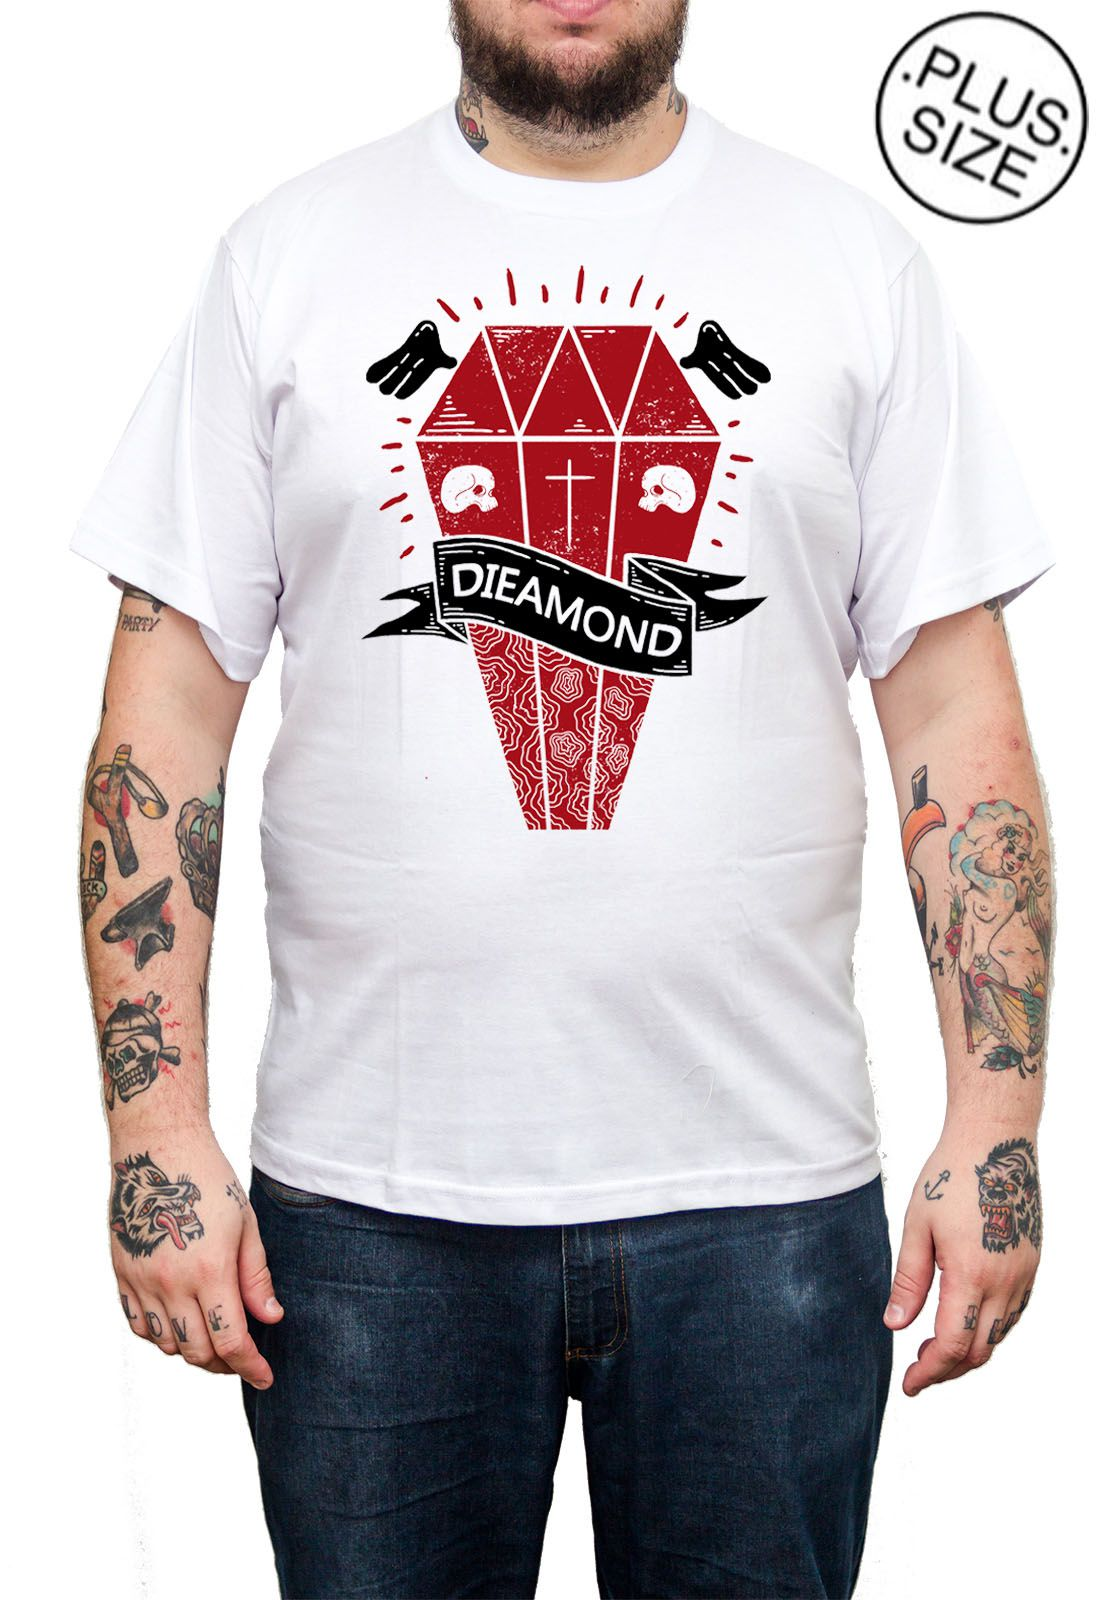 Camiseta Hshop Dieamond - Branco - Plus Size - Tamanho Grande XG  - HShop